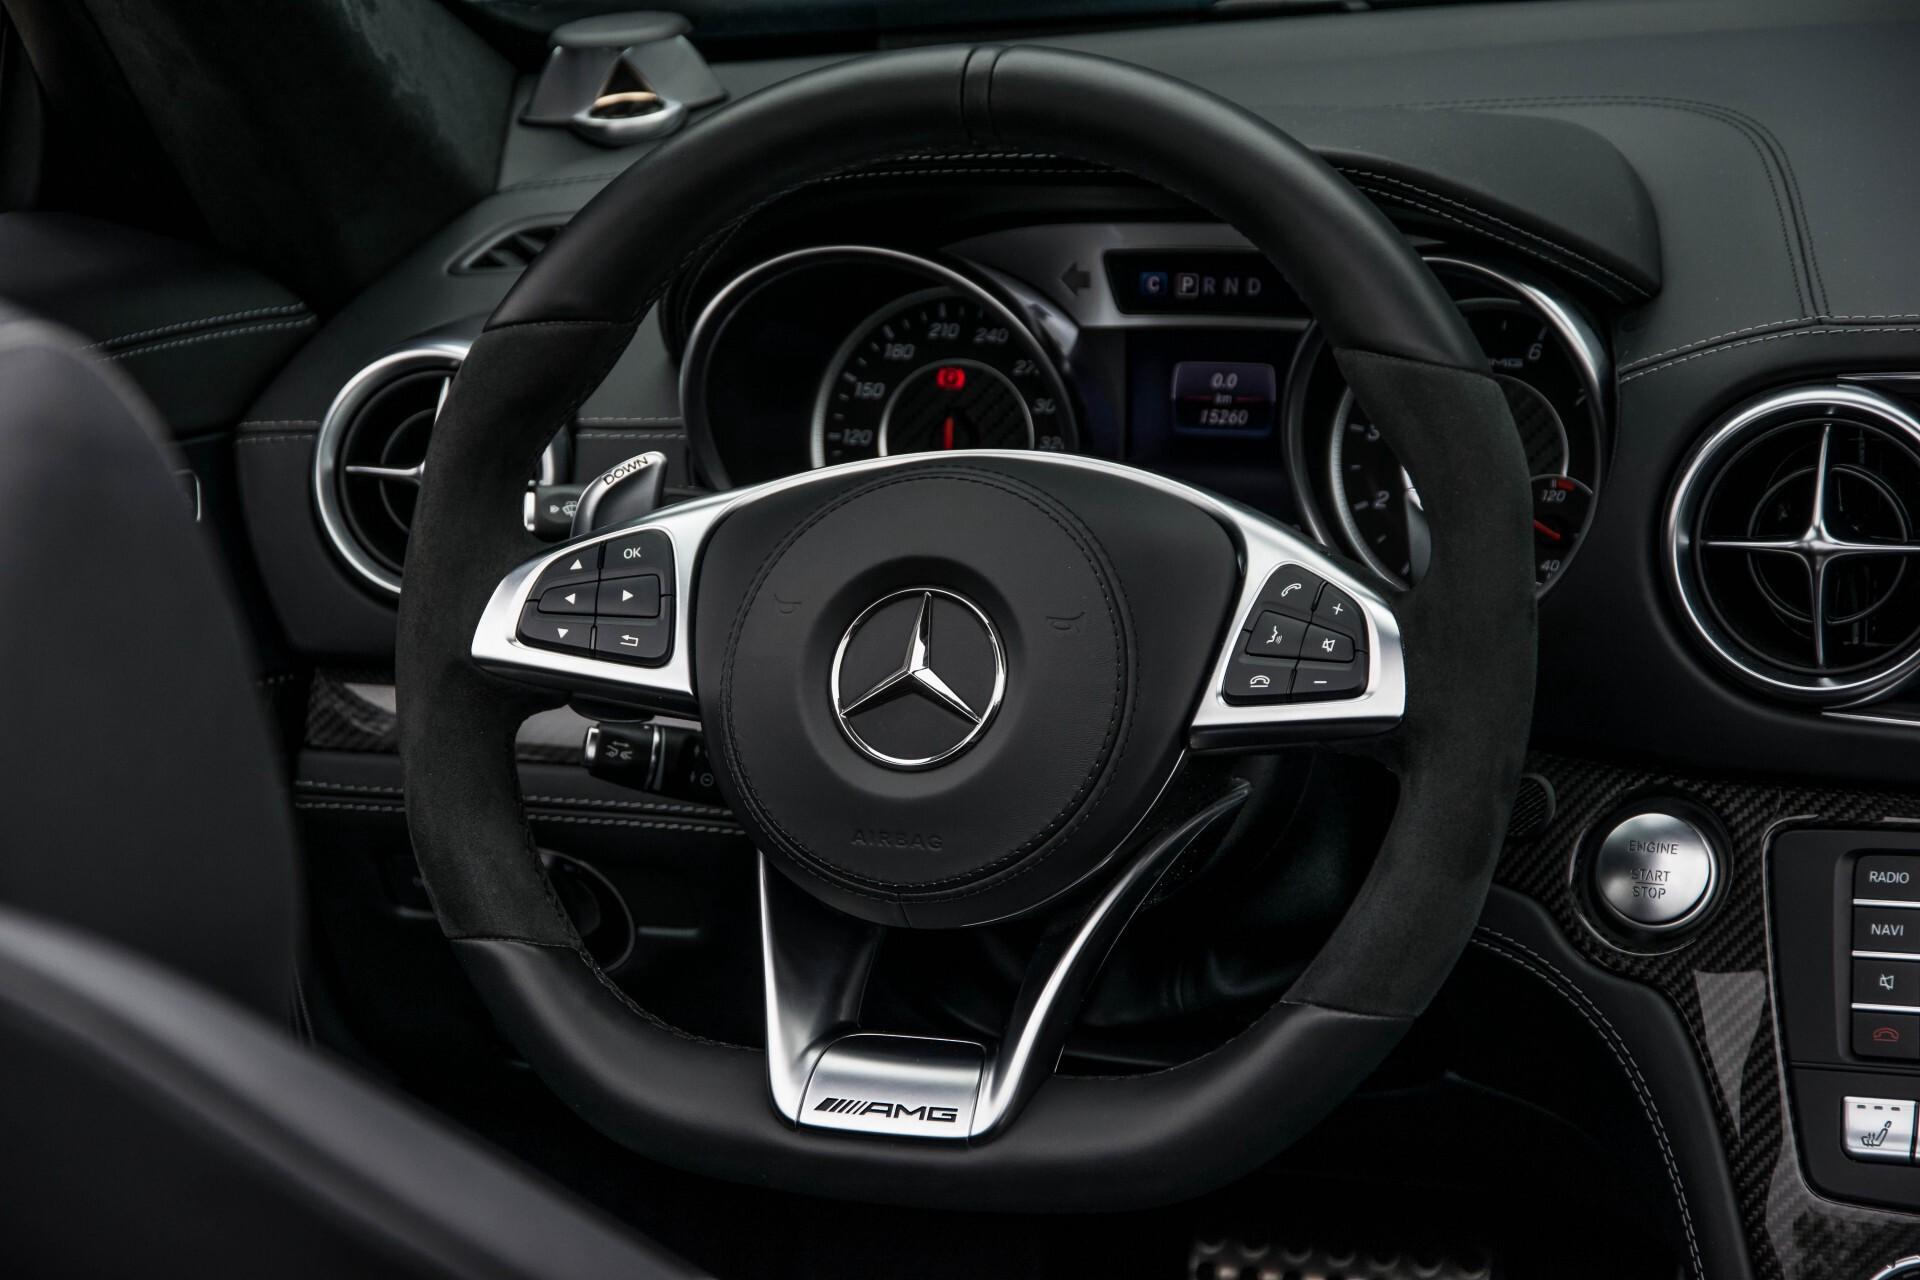 Mercedes-Benz SL-Klasse 63 AMG Keramisch/Bang & Olufsen/Designo/Carbon/Drivers Package Aut7 Foto 9